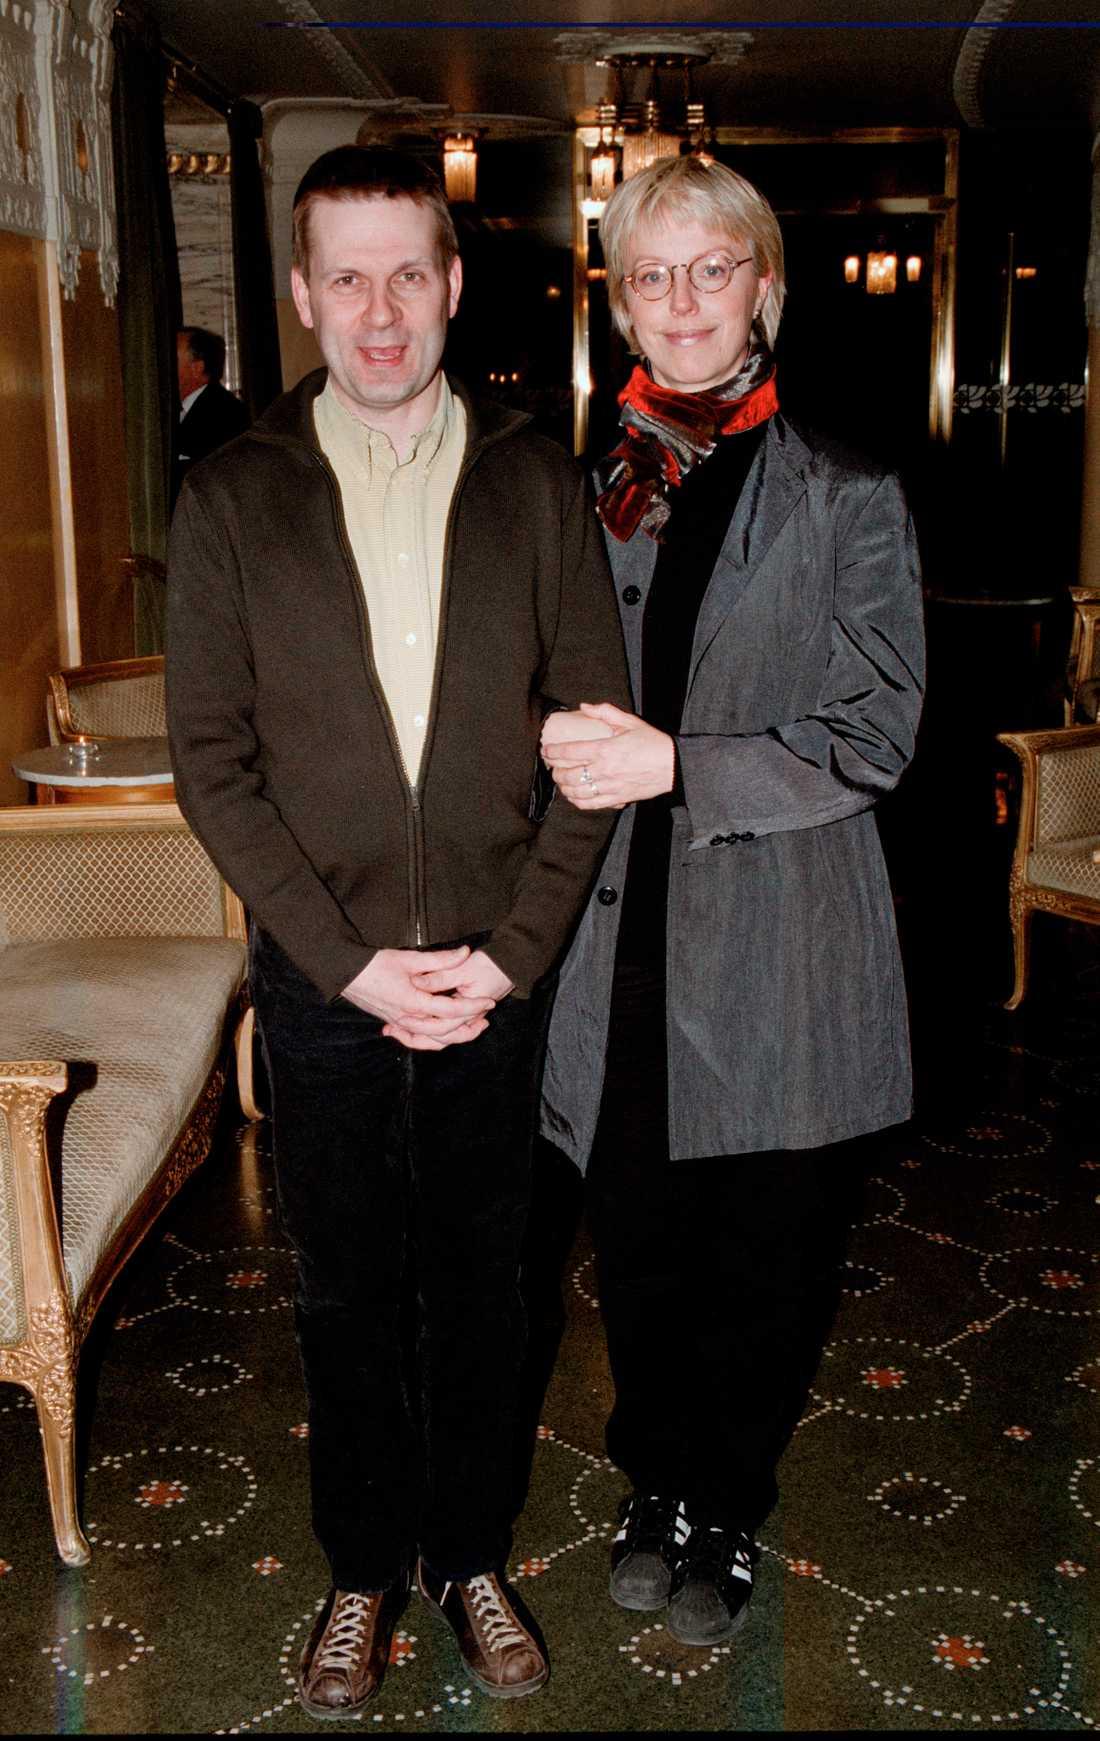 Stipendieutdelning på Dramaten år 2000. Benny Fredriksson och hustrun Anne Sofie von Otter.